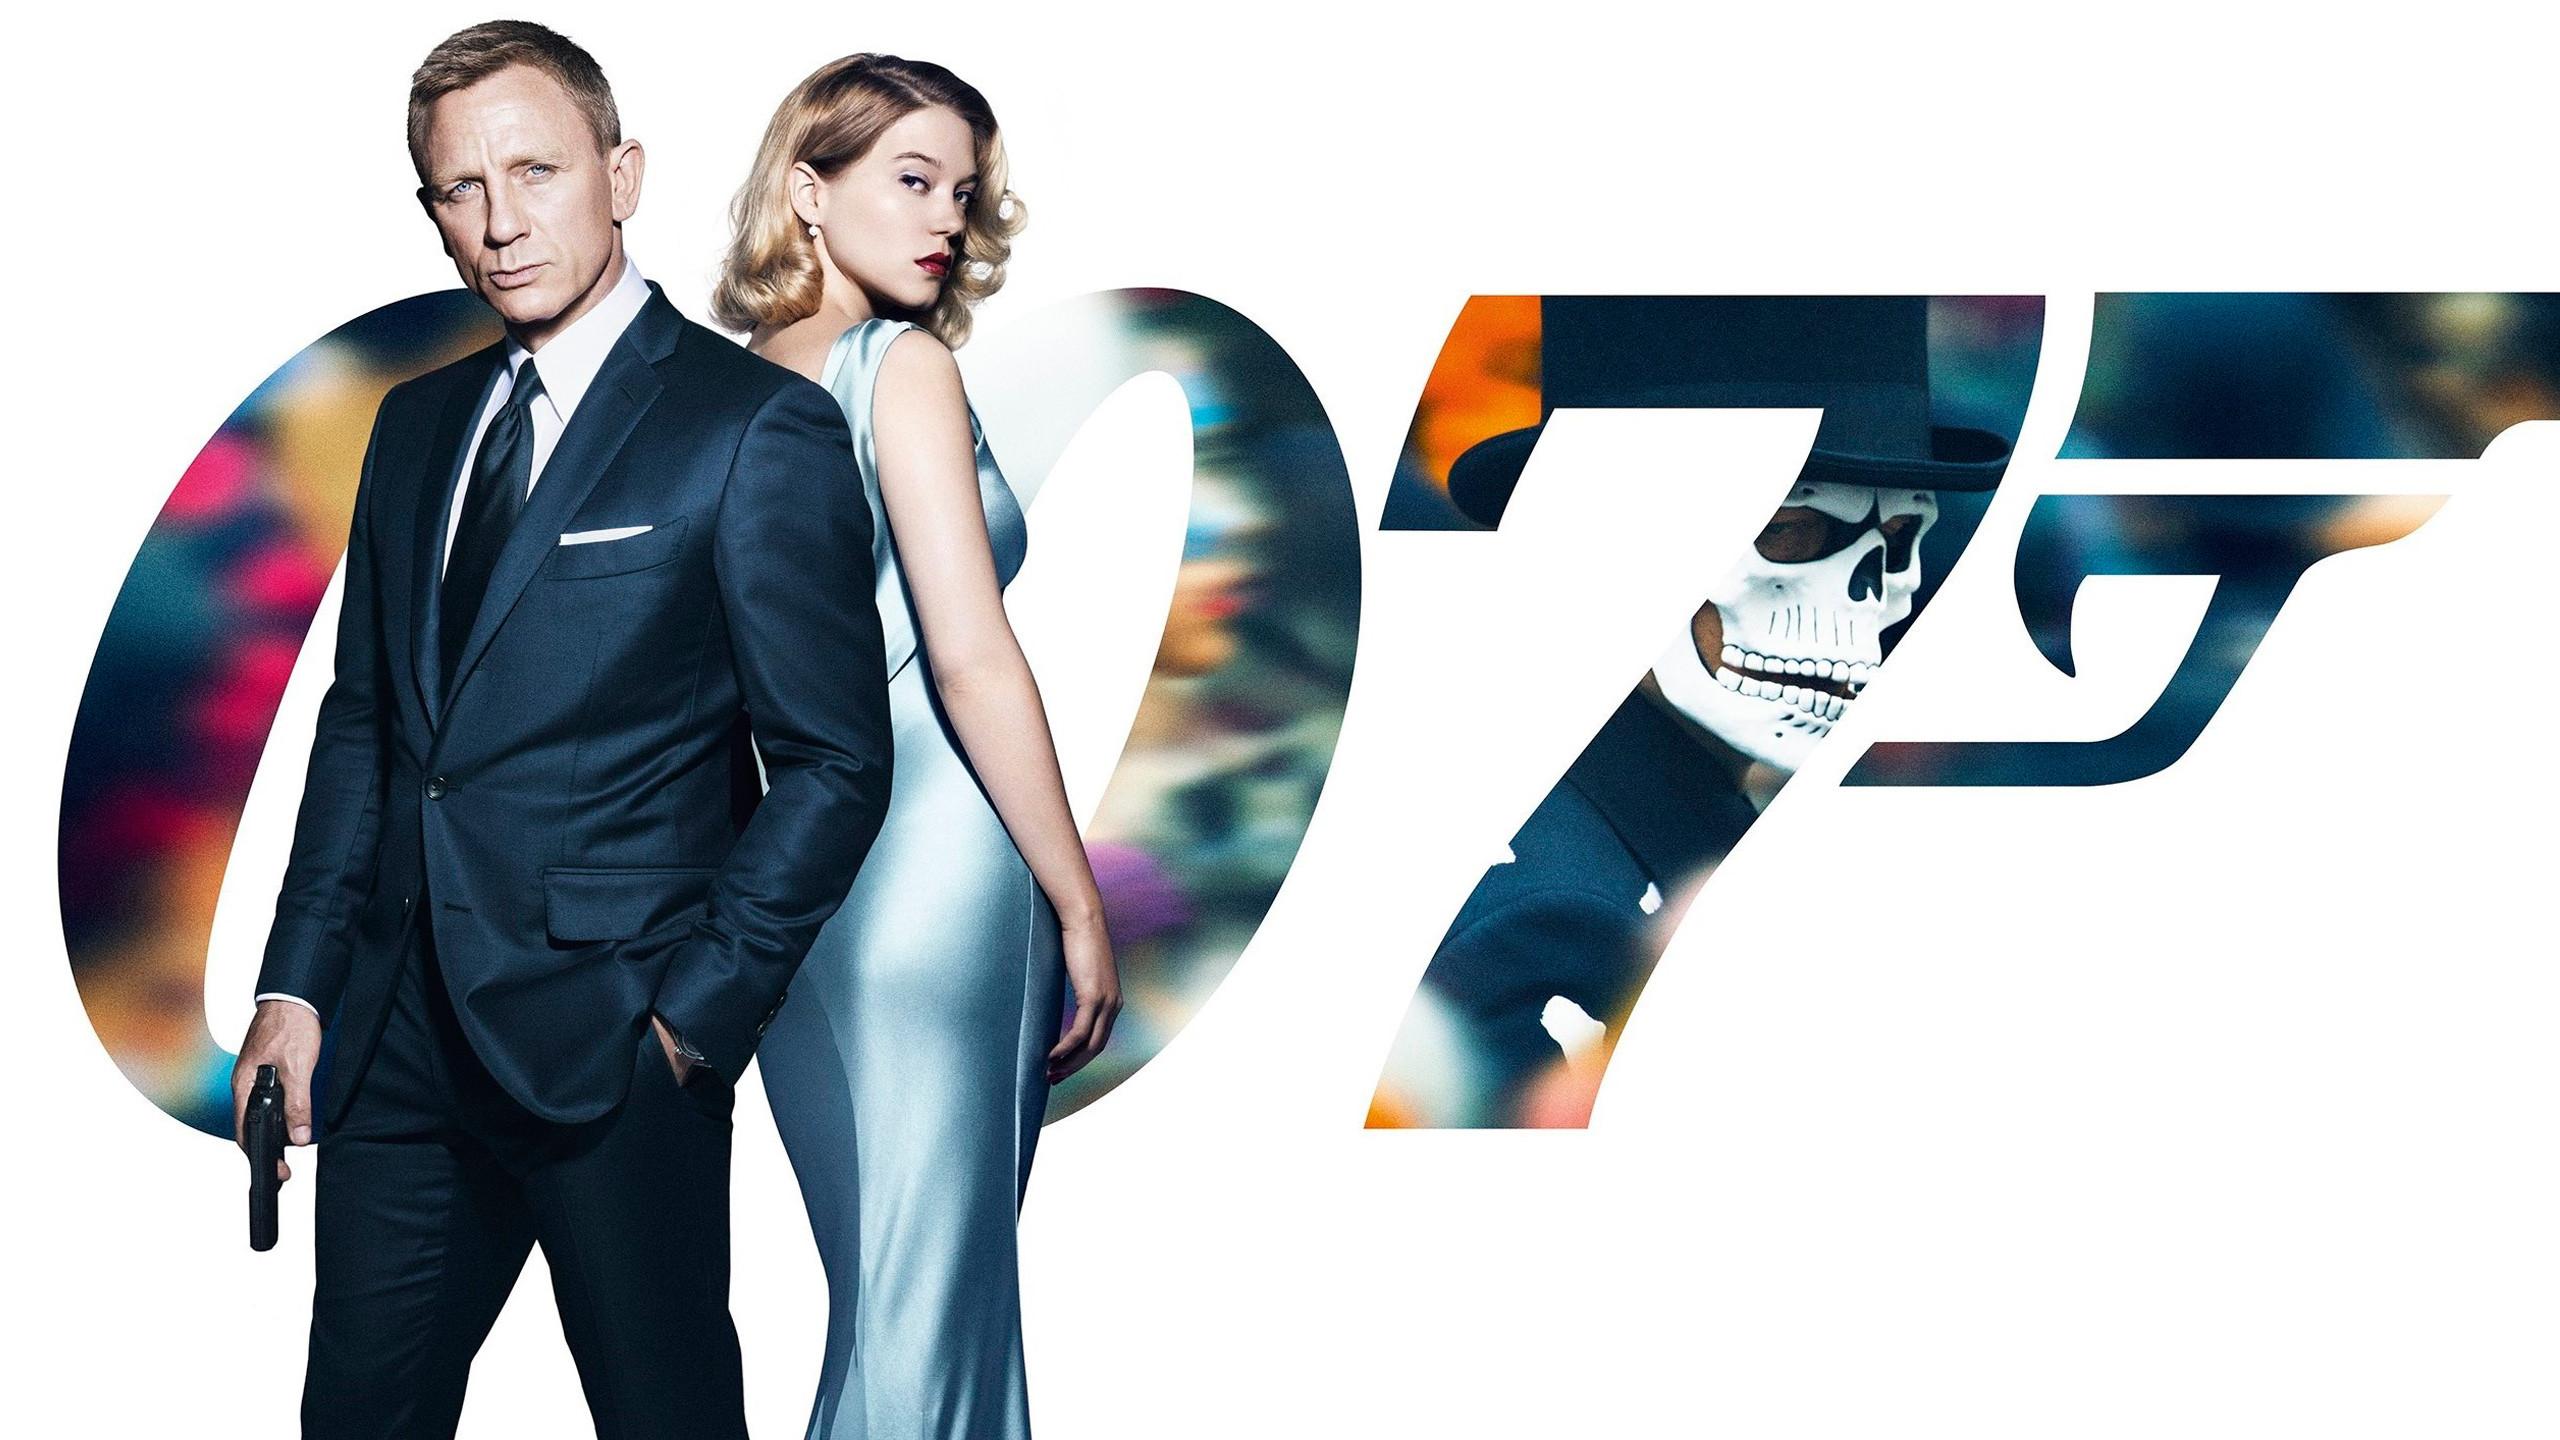 Res: 2560x1440, Spectre 2015 Bond Movie Wallpaper